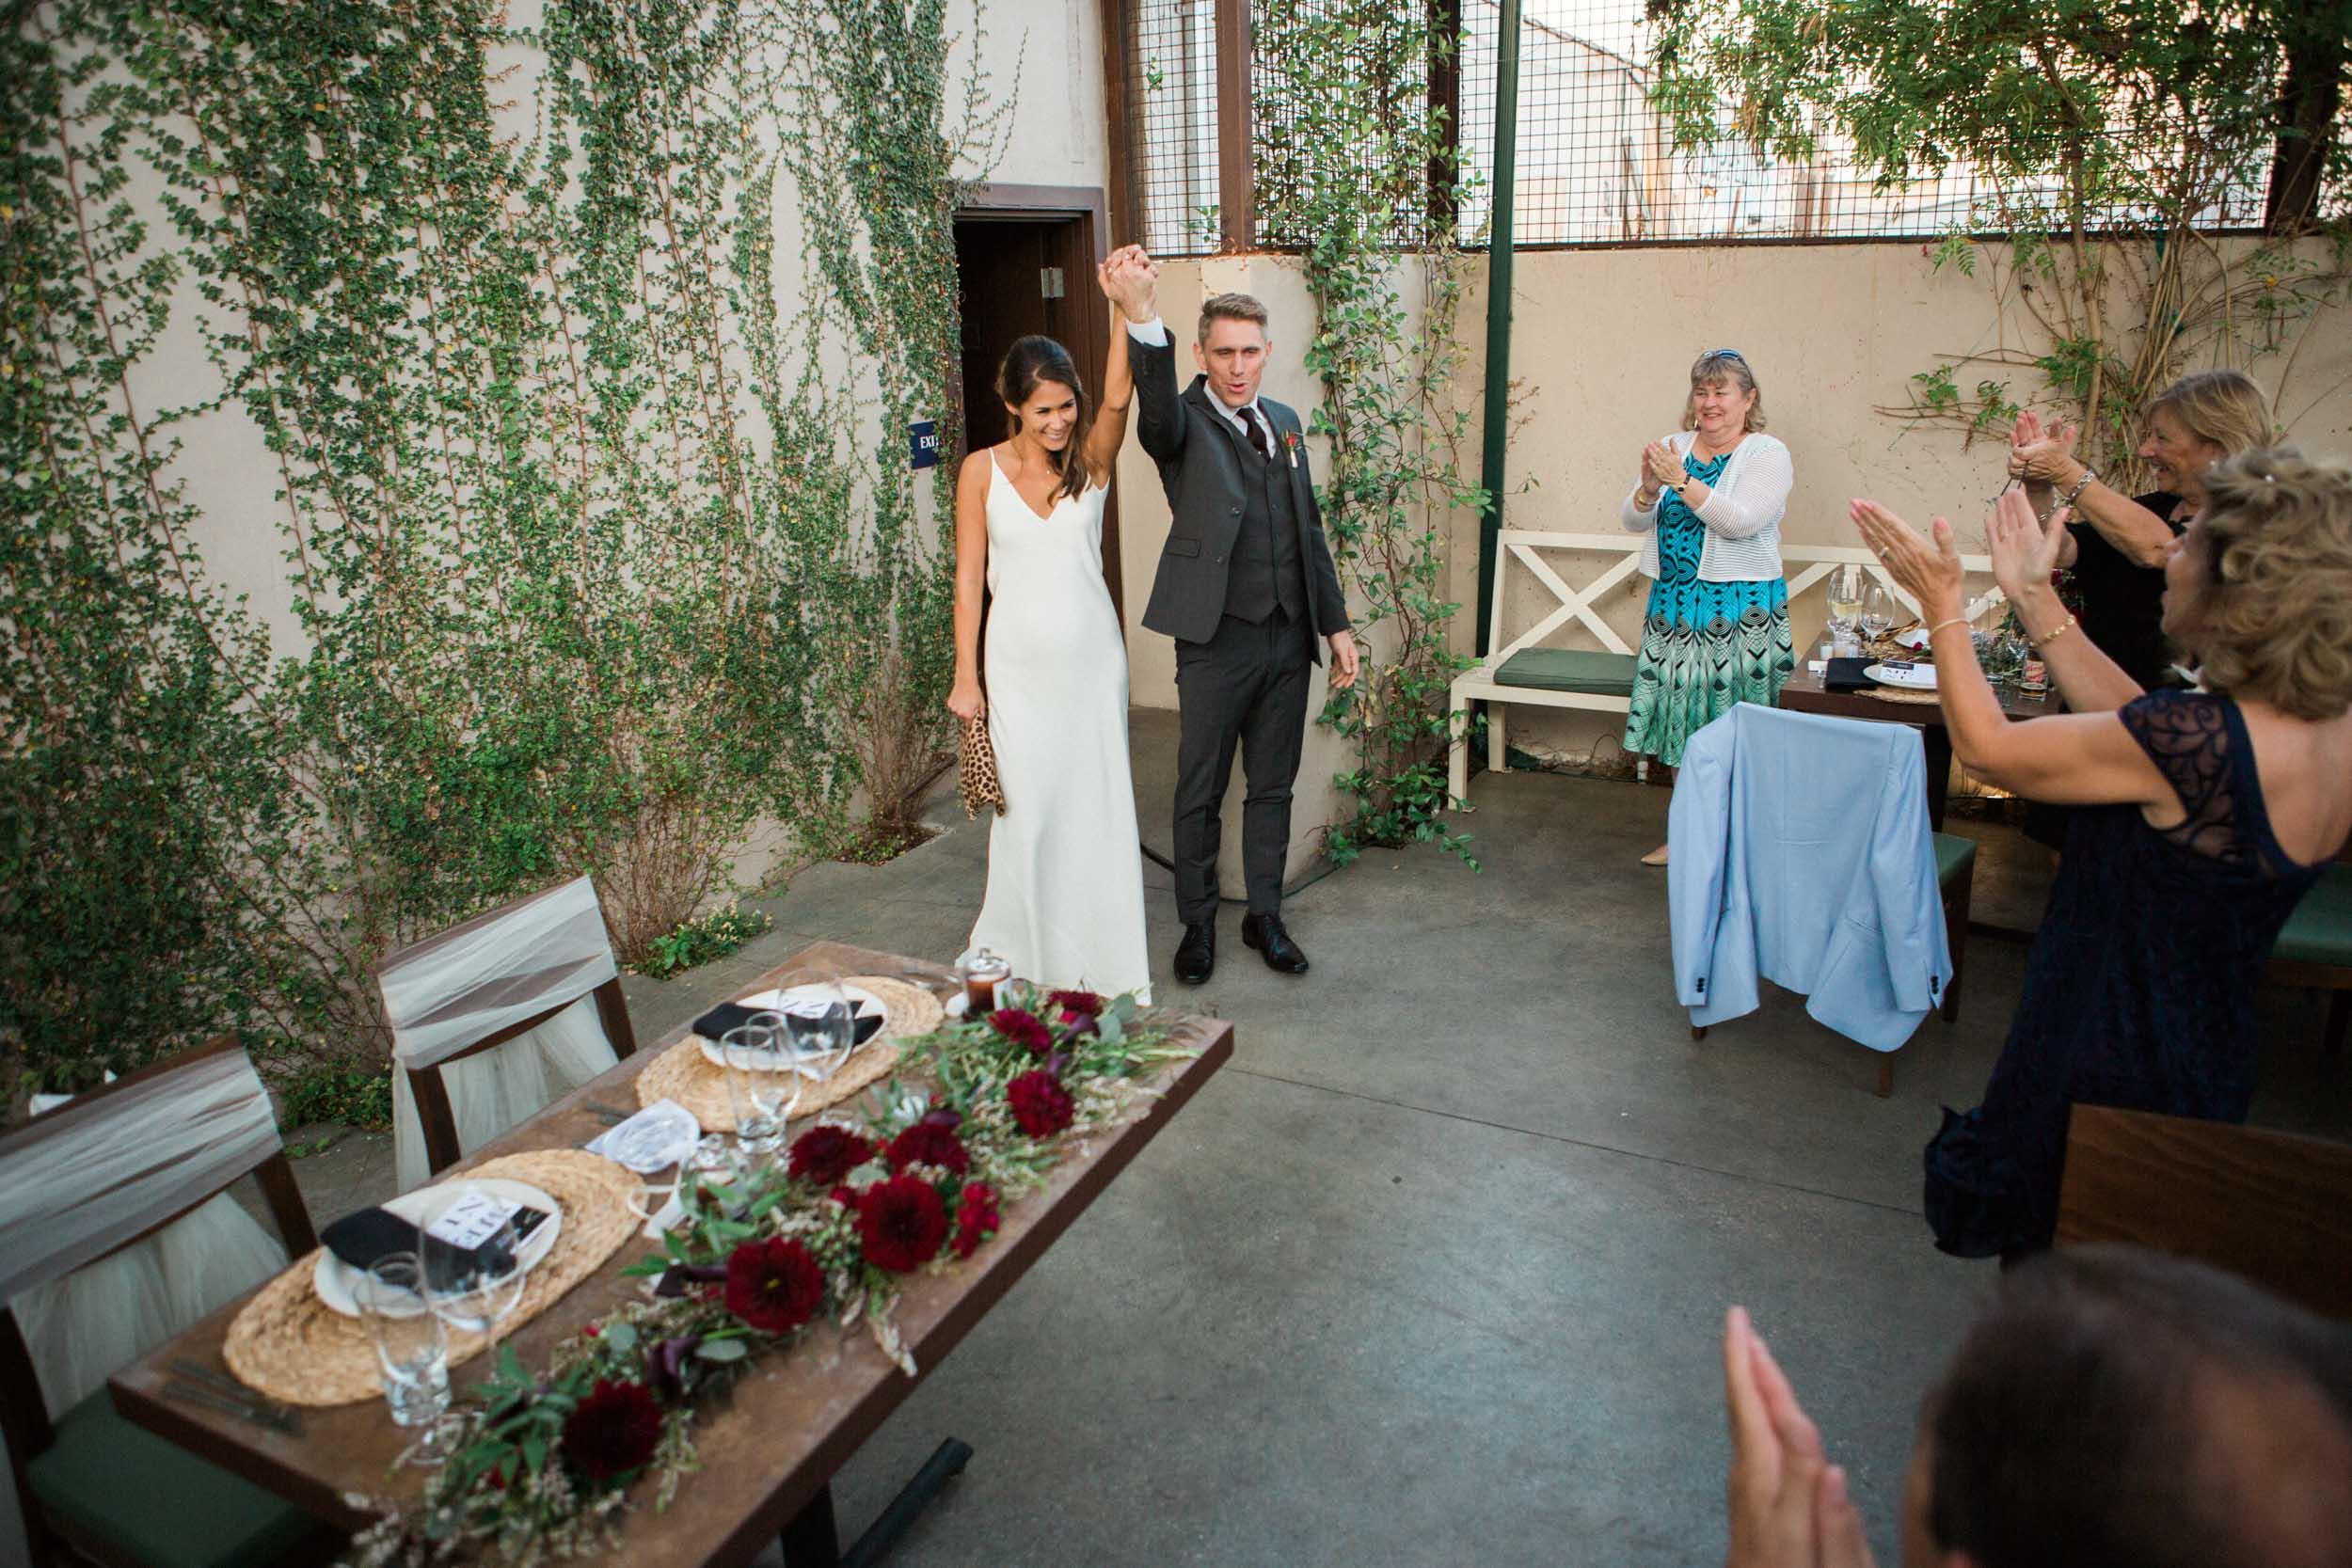 BKM-Photography-Highland-Park-Los-Angeles-Backyard-Wedding-0052.jpg